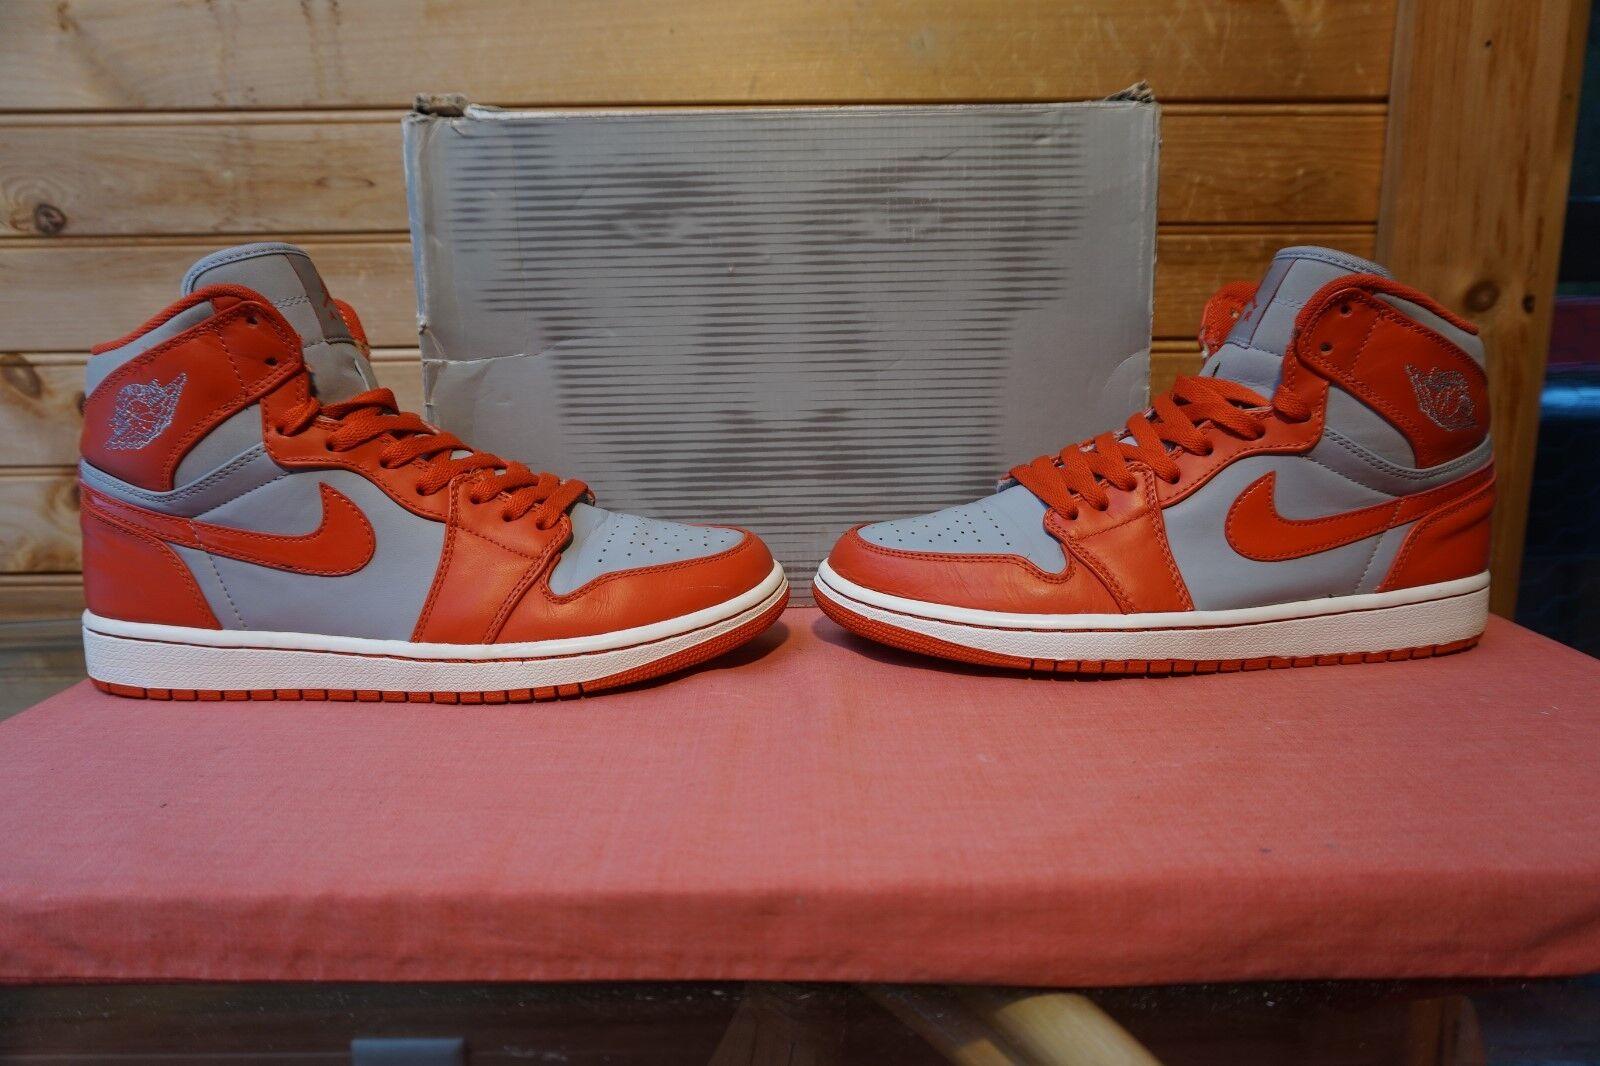 2010 Nike Air Jordan 1 Retro High Wolf Grey Spice White Sz 8 (0722) 332550-006